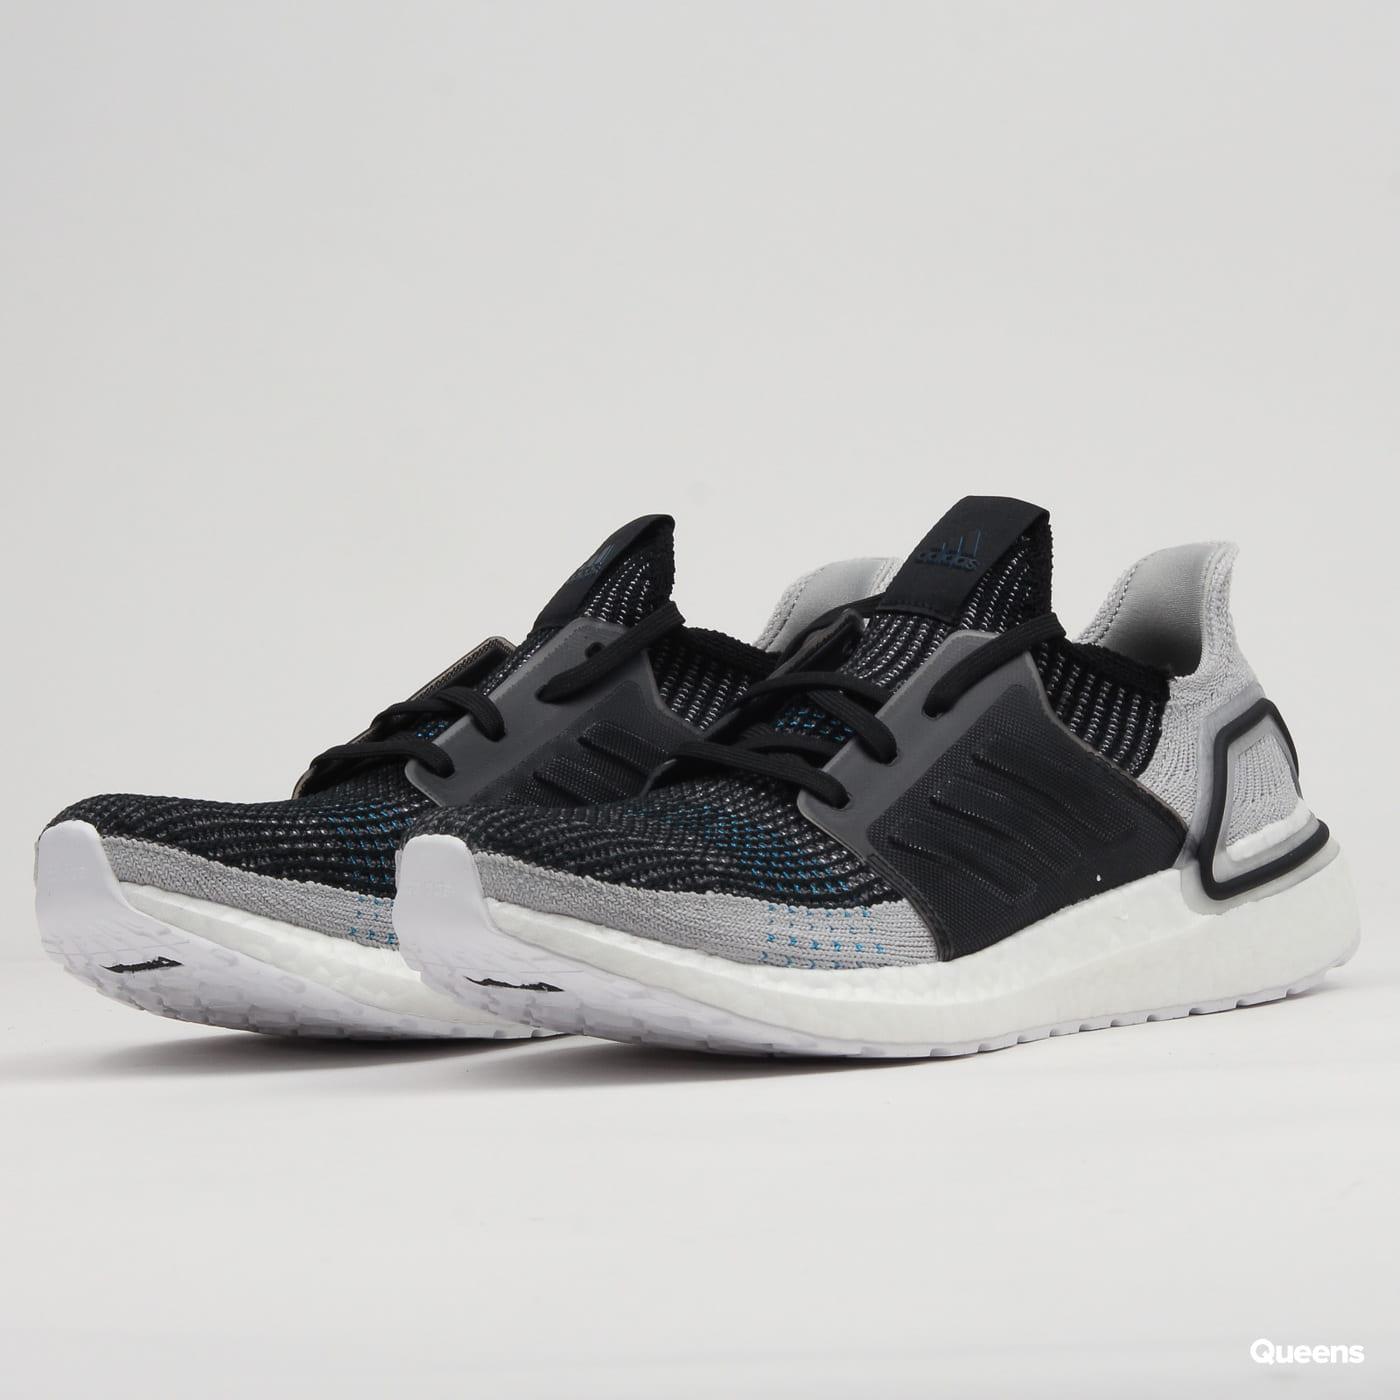 adidas ultra boost grey and black, adidas Performance